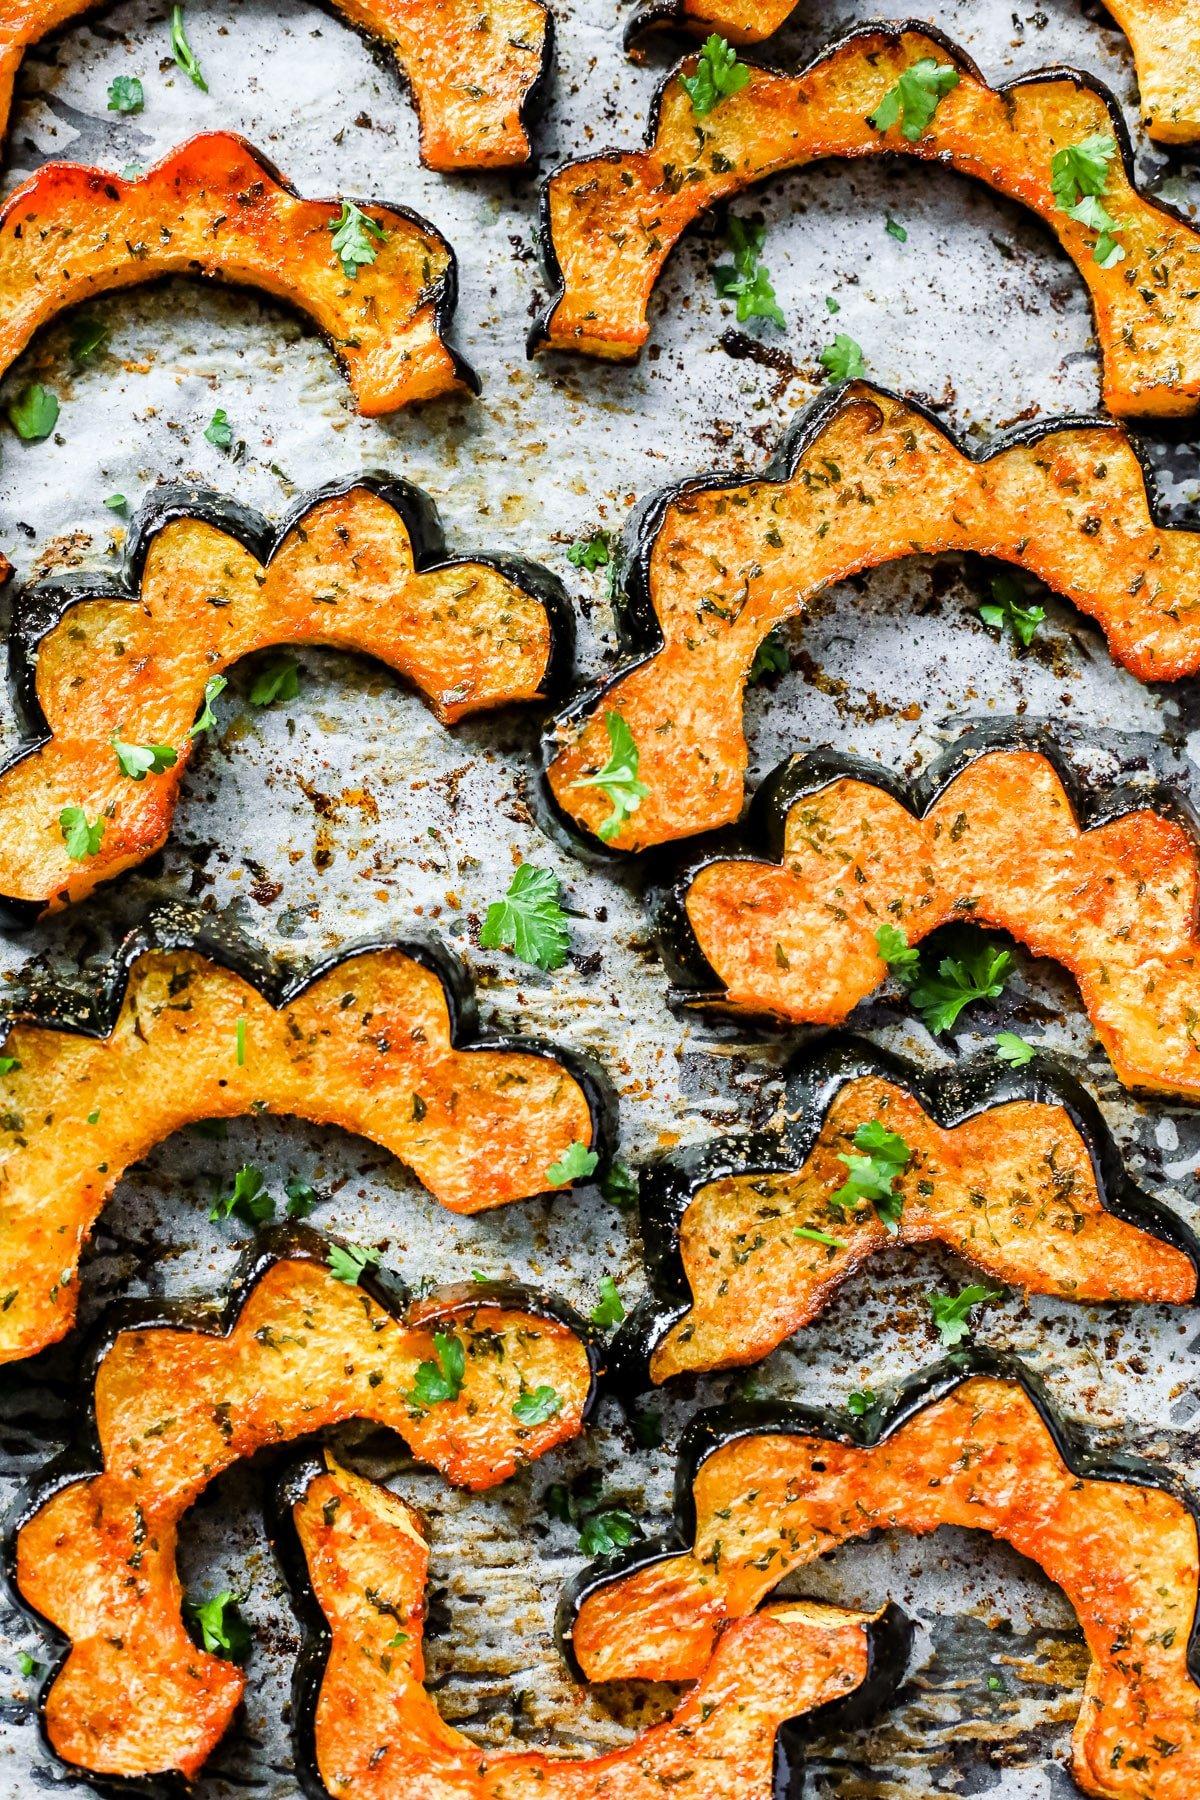 close up - Easy Roasted Acorn Squash on a baking sheet